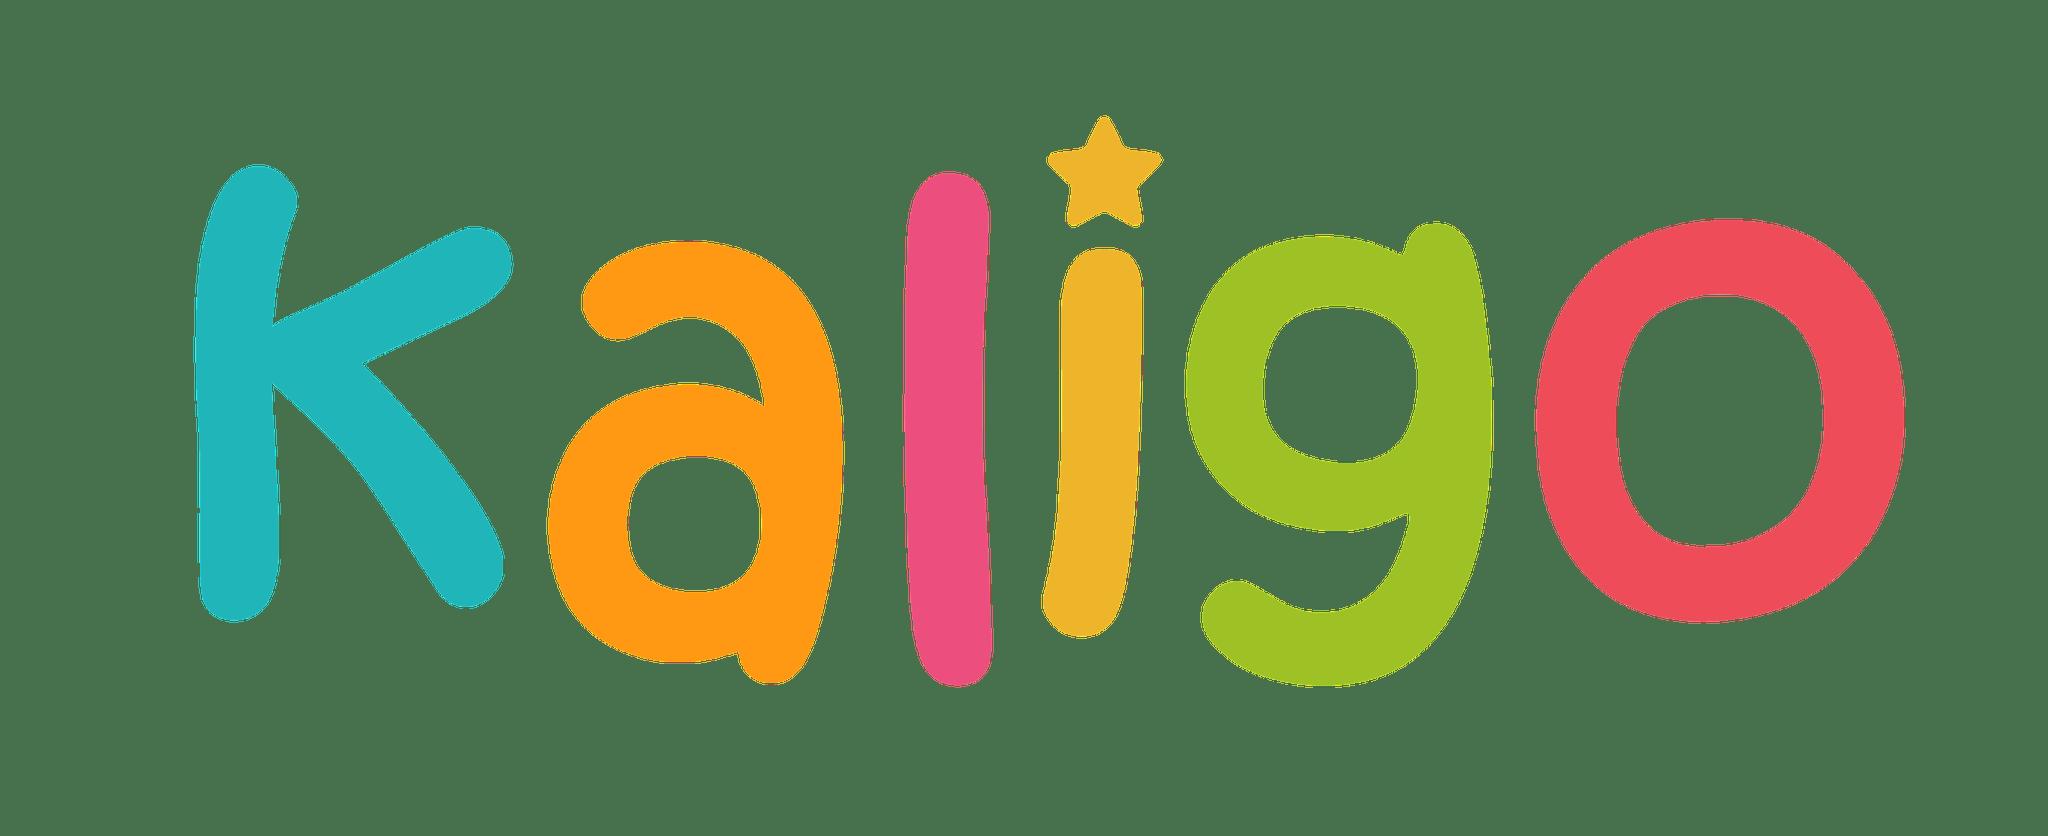 Kaligo International